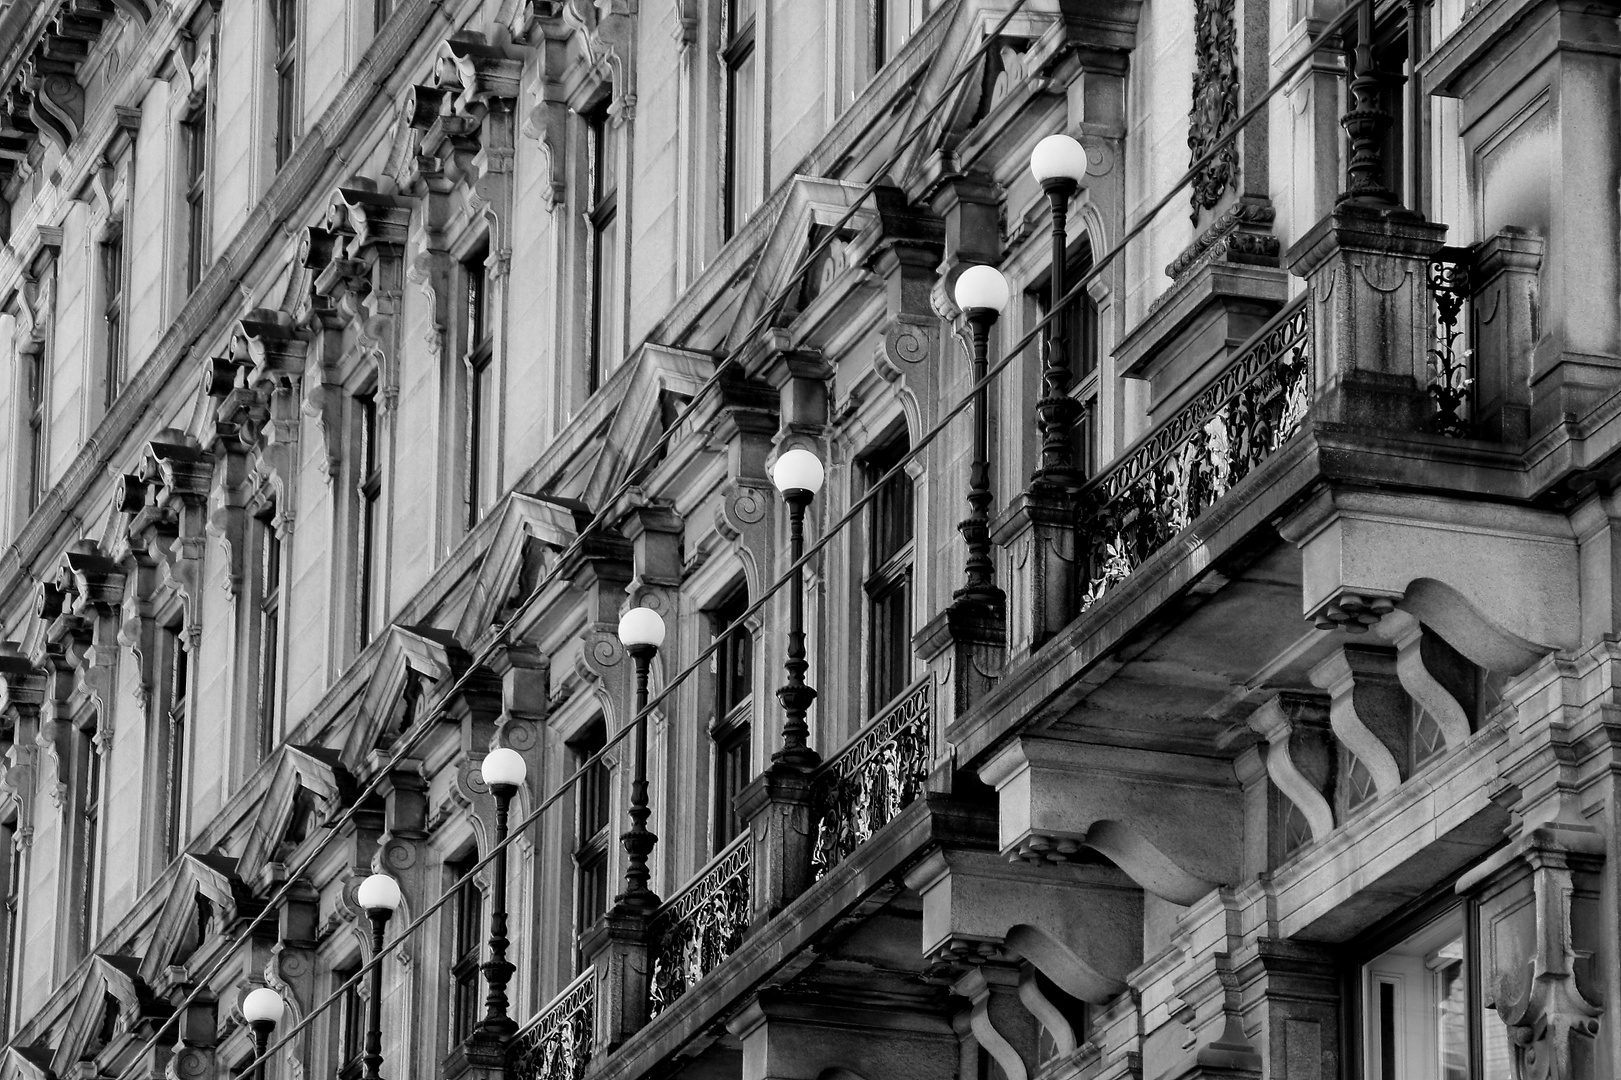 Aufwendige Fassadengestaltung